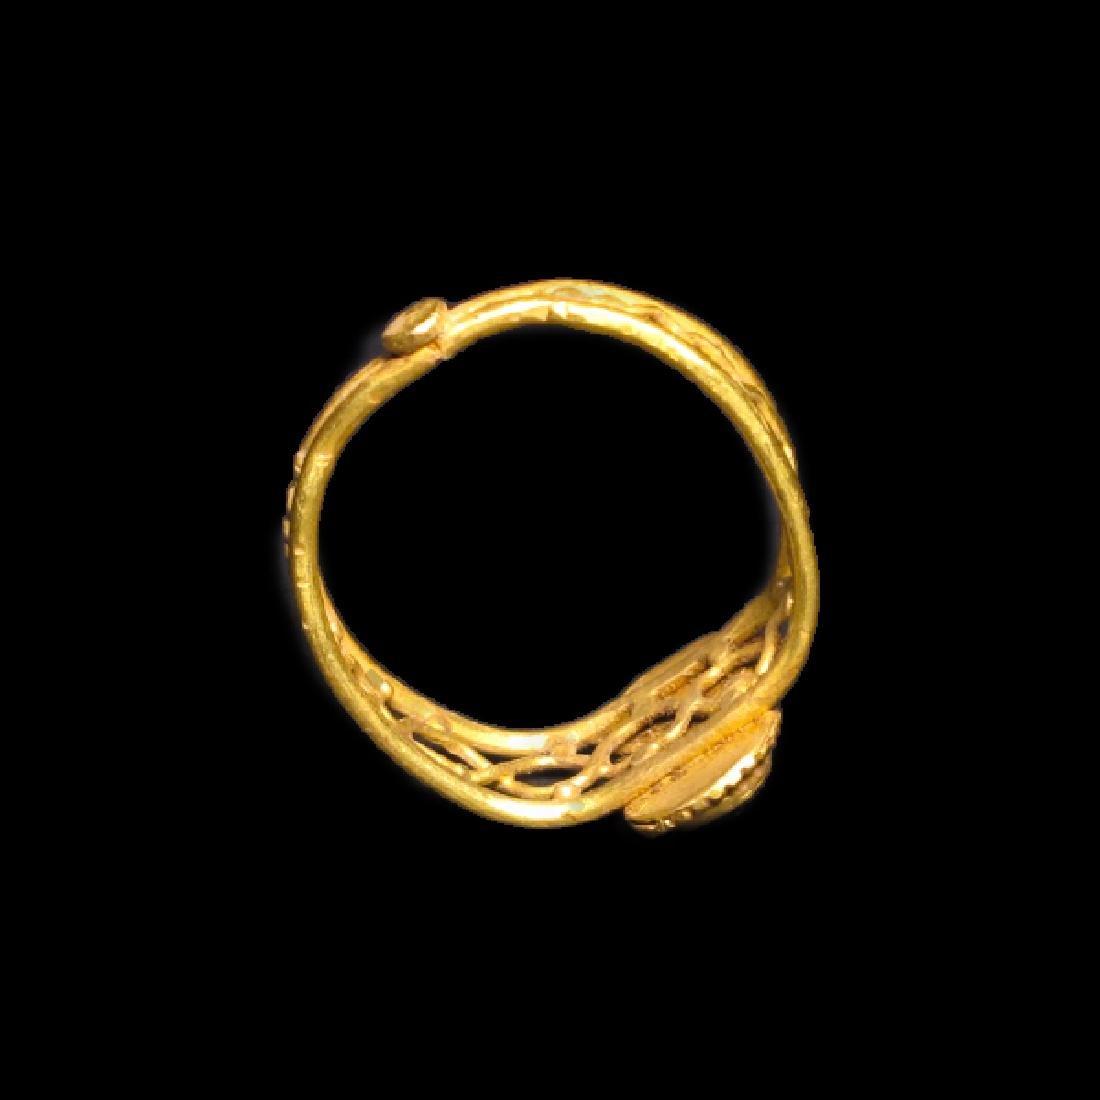 Roman Gold and Garnet Ring, c. 2nd-3rd Century A.D. - 5